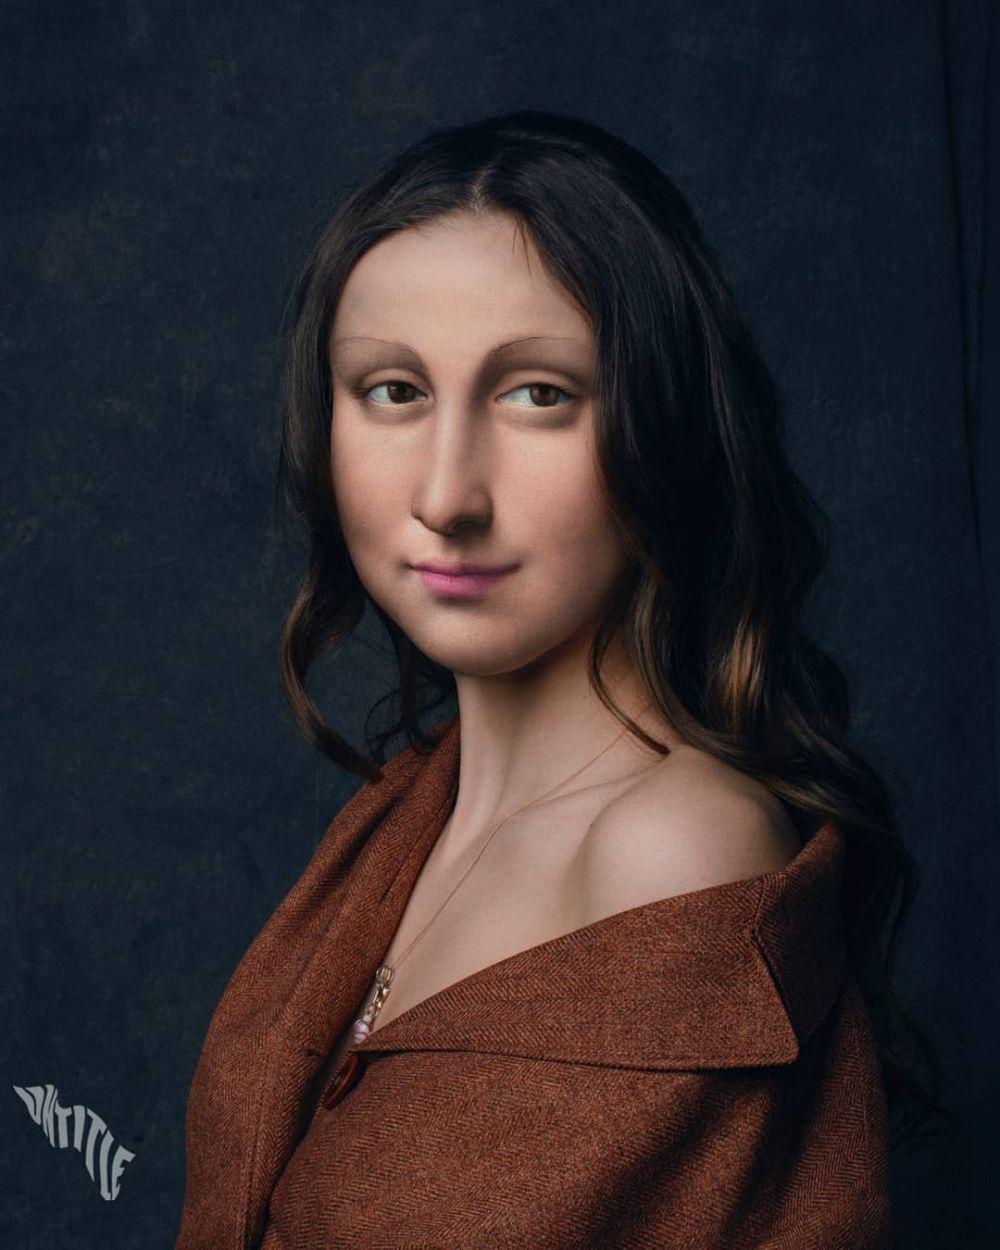 sosok lukisan terkenal jadi model kekinian © Instagram/@untitled.save